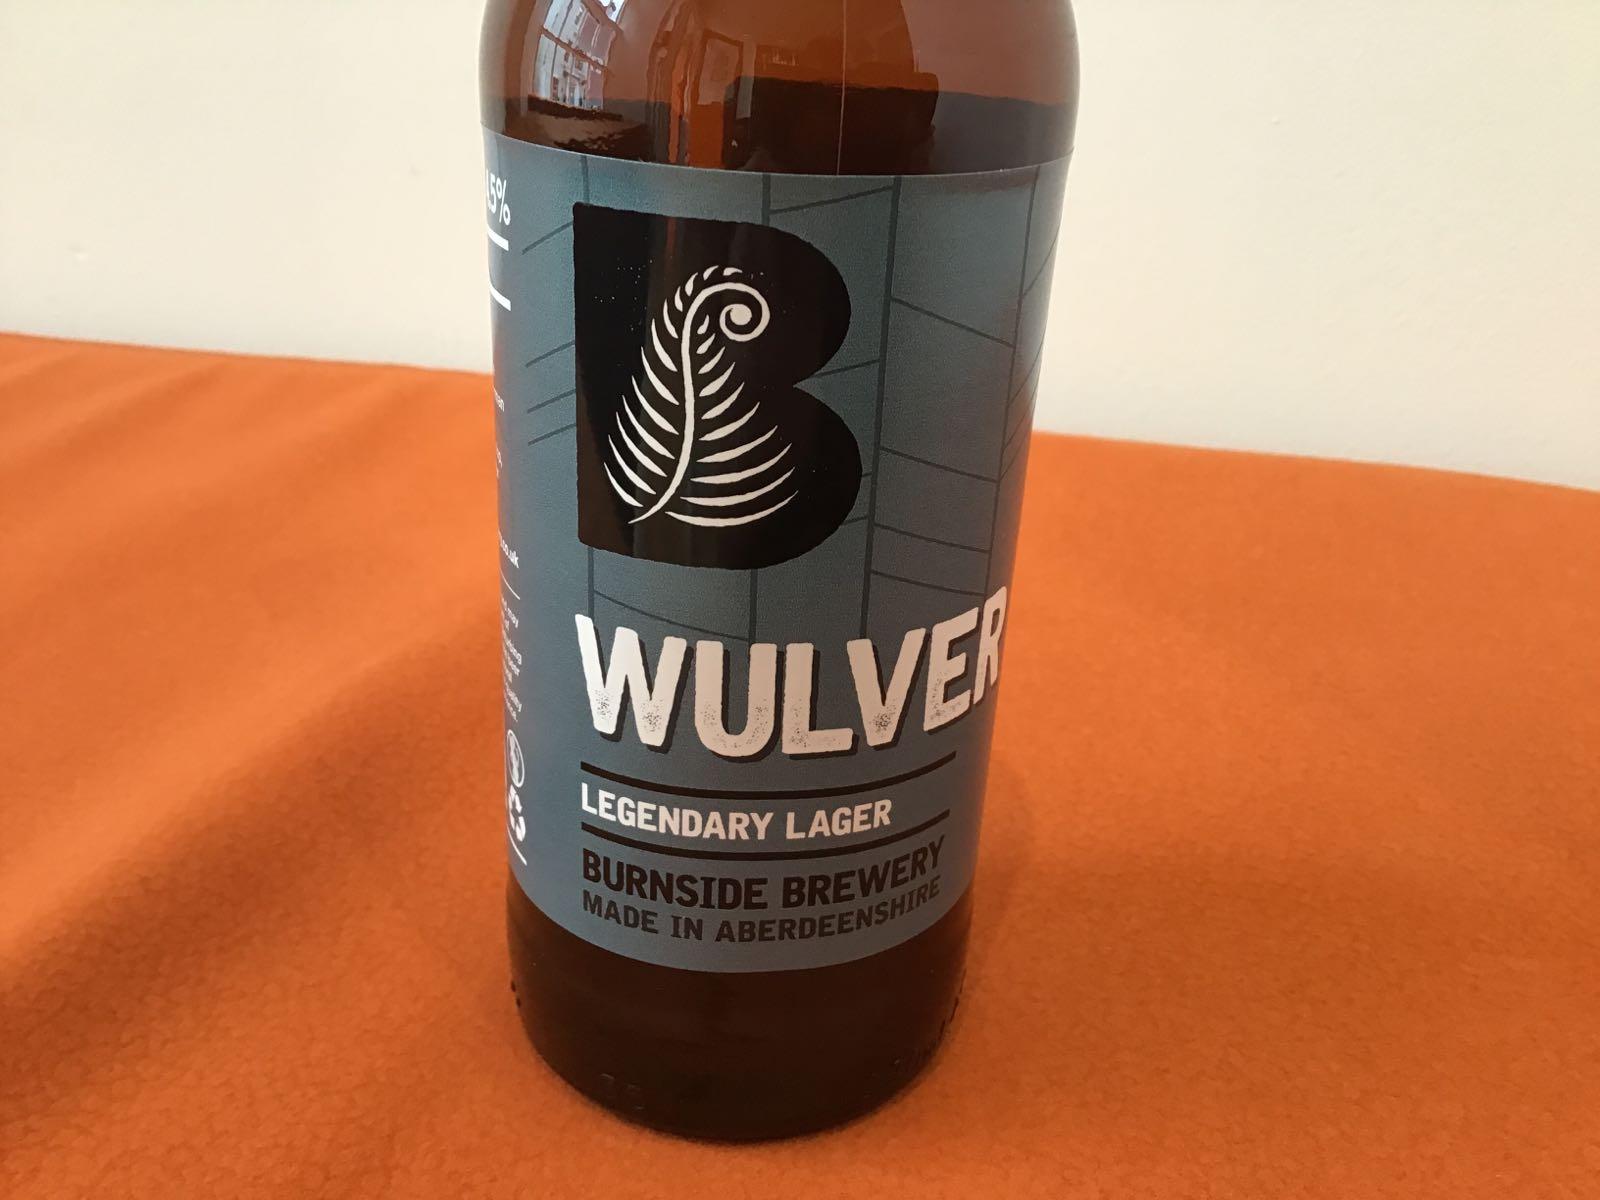 Burnside Brewery: Wulver Legendary Lager